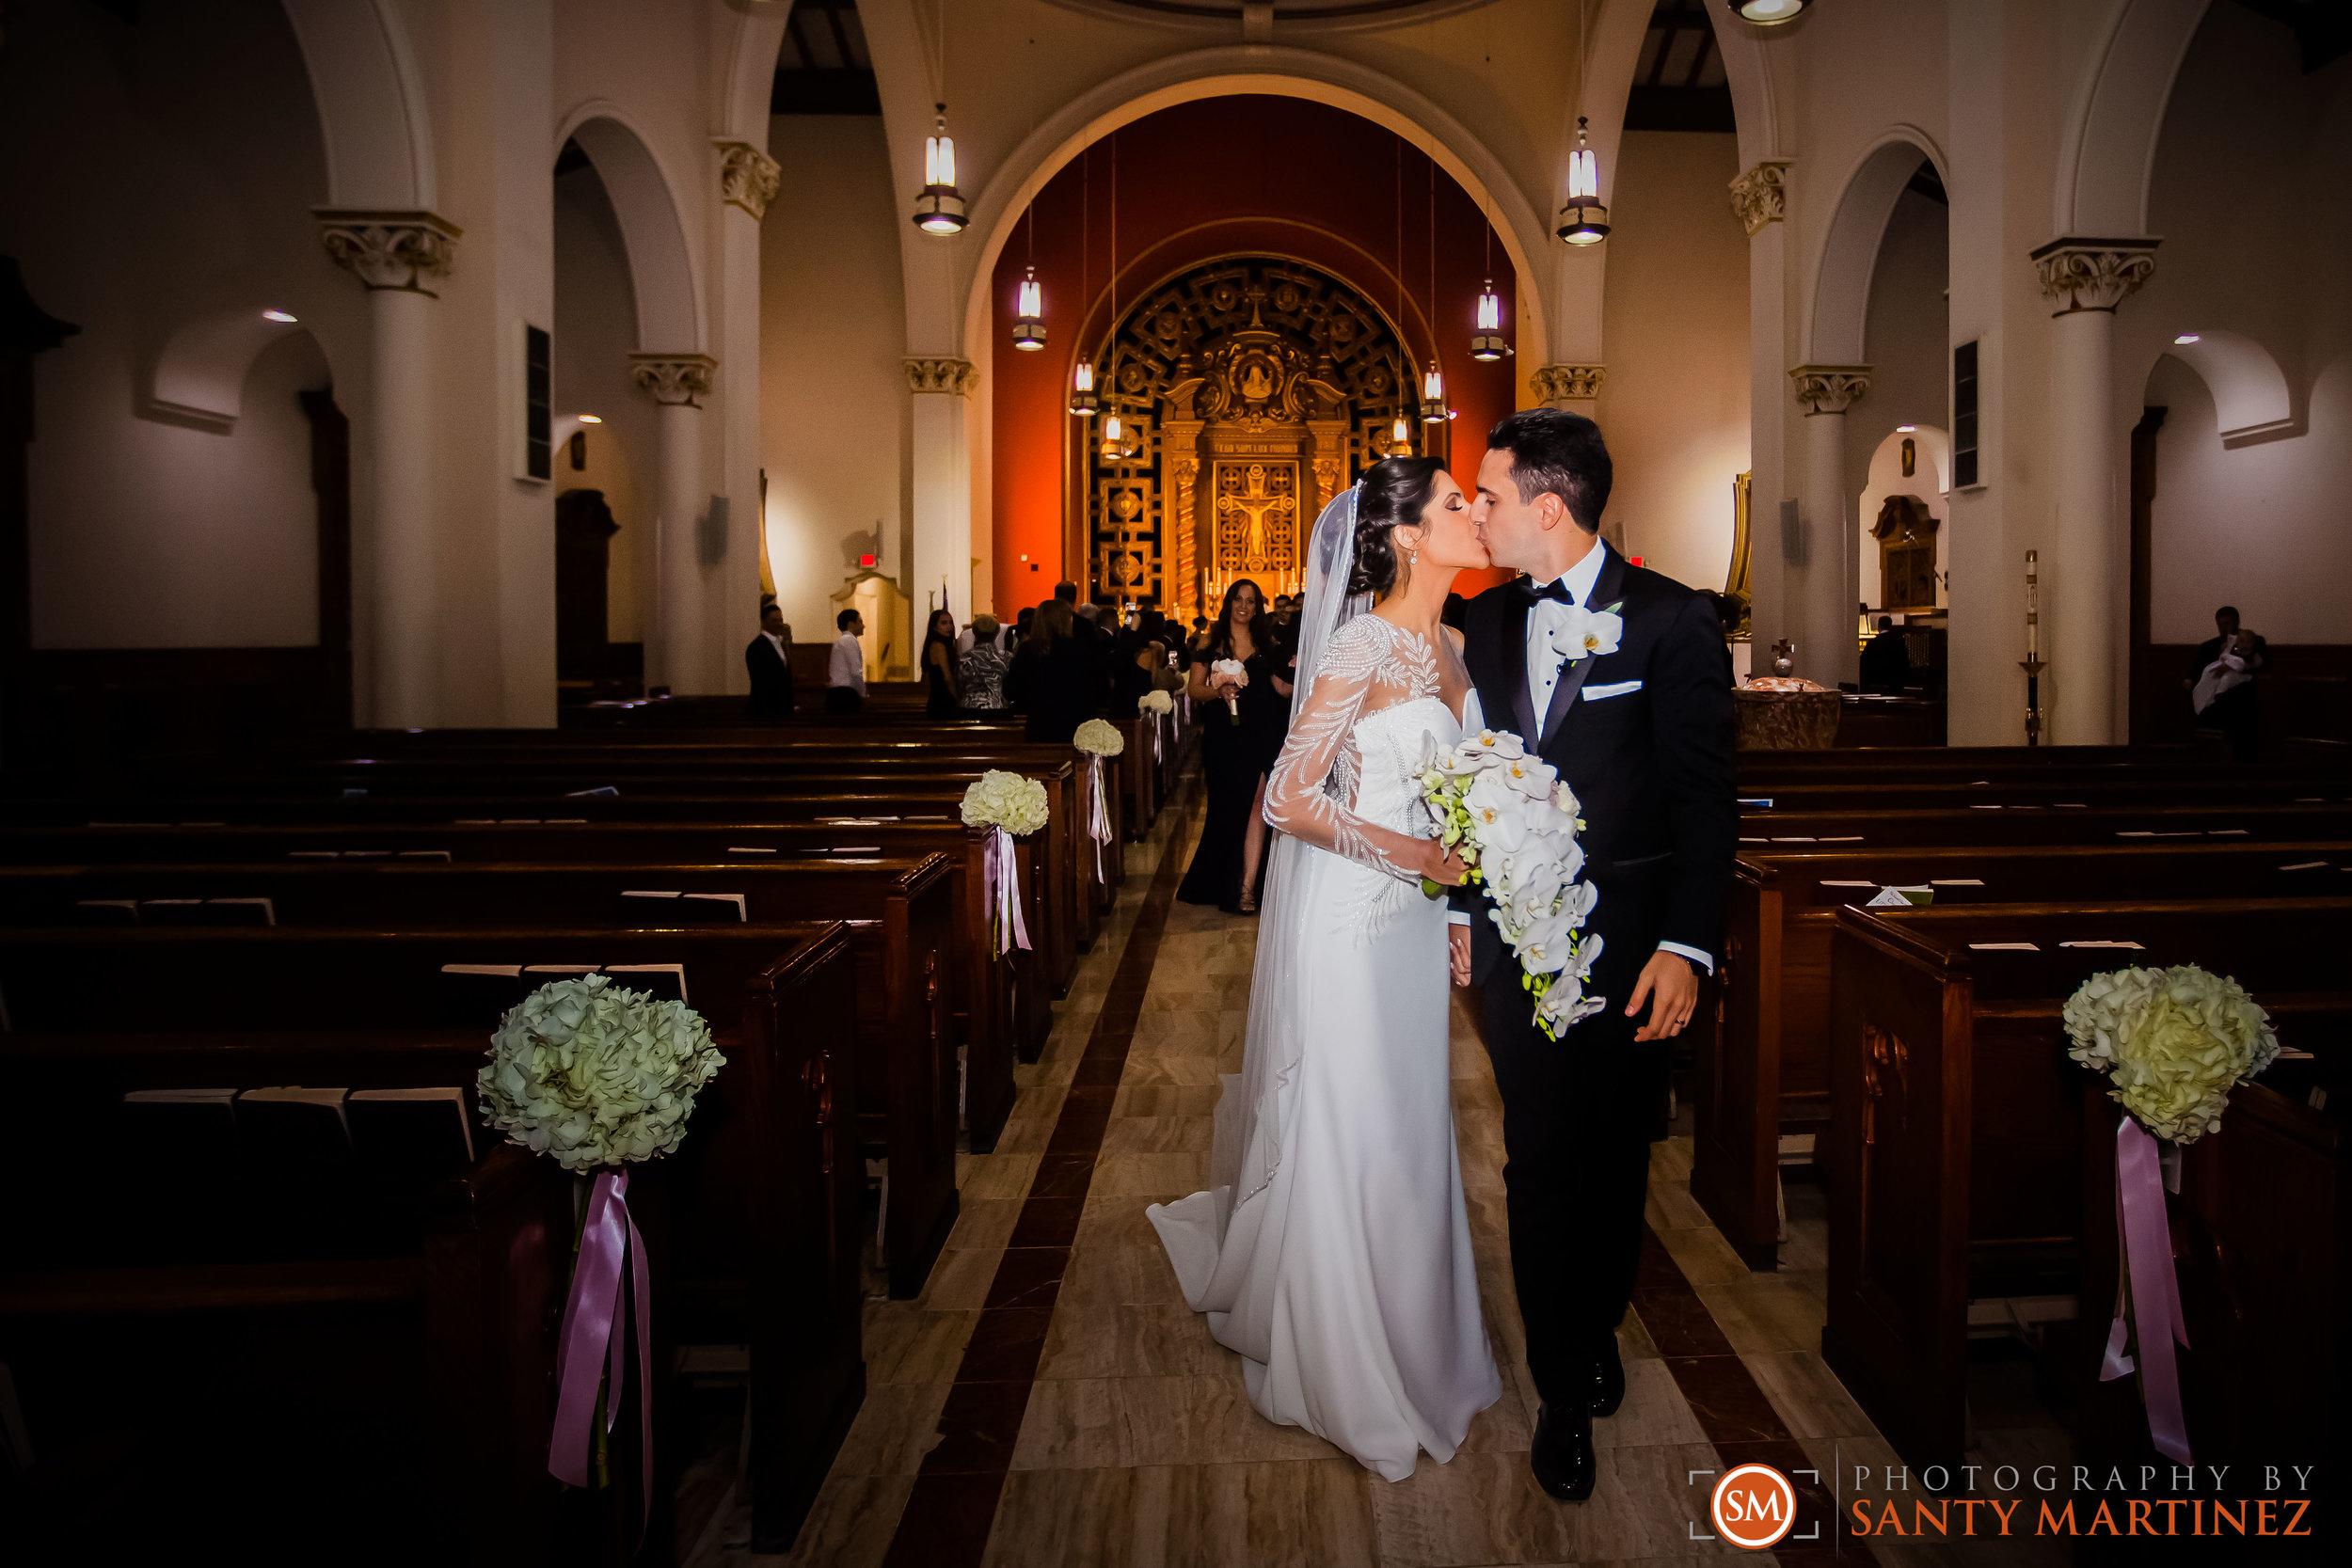 Wedding Trump National Doral Miami - Photography by Santy Martinez-16.jpg